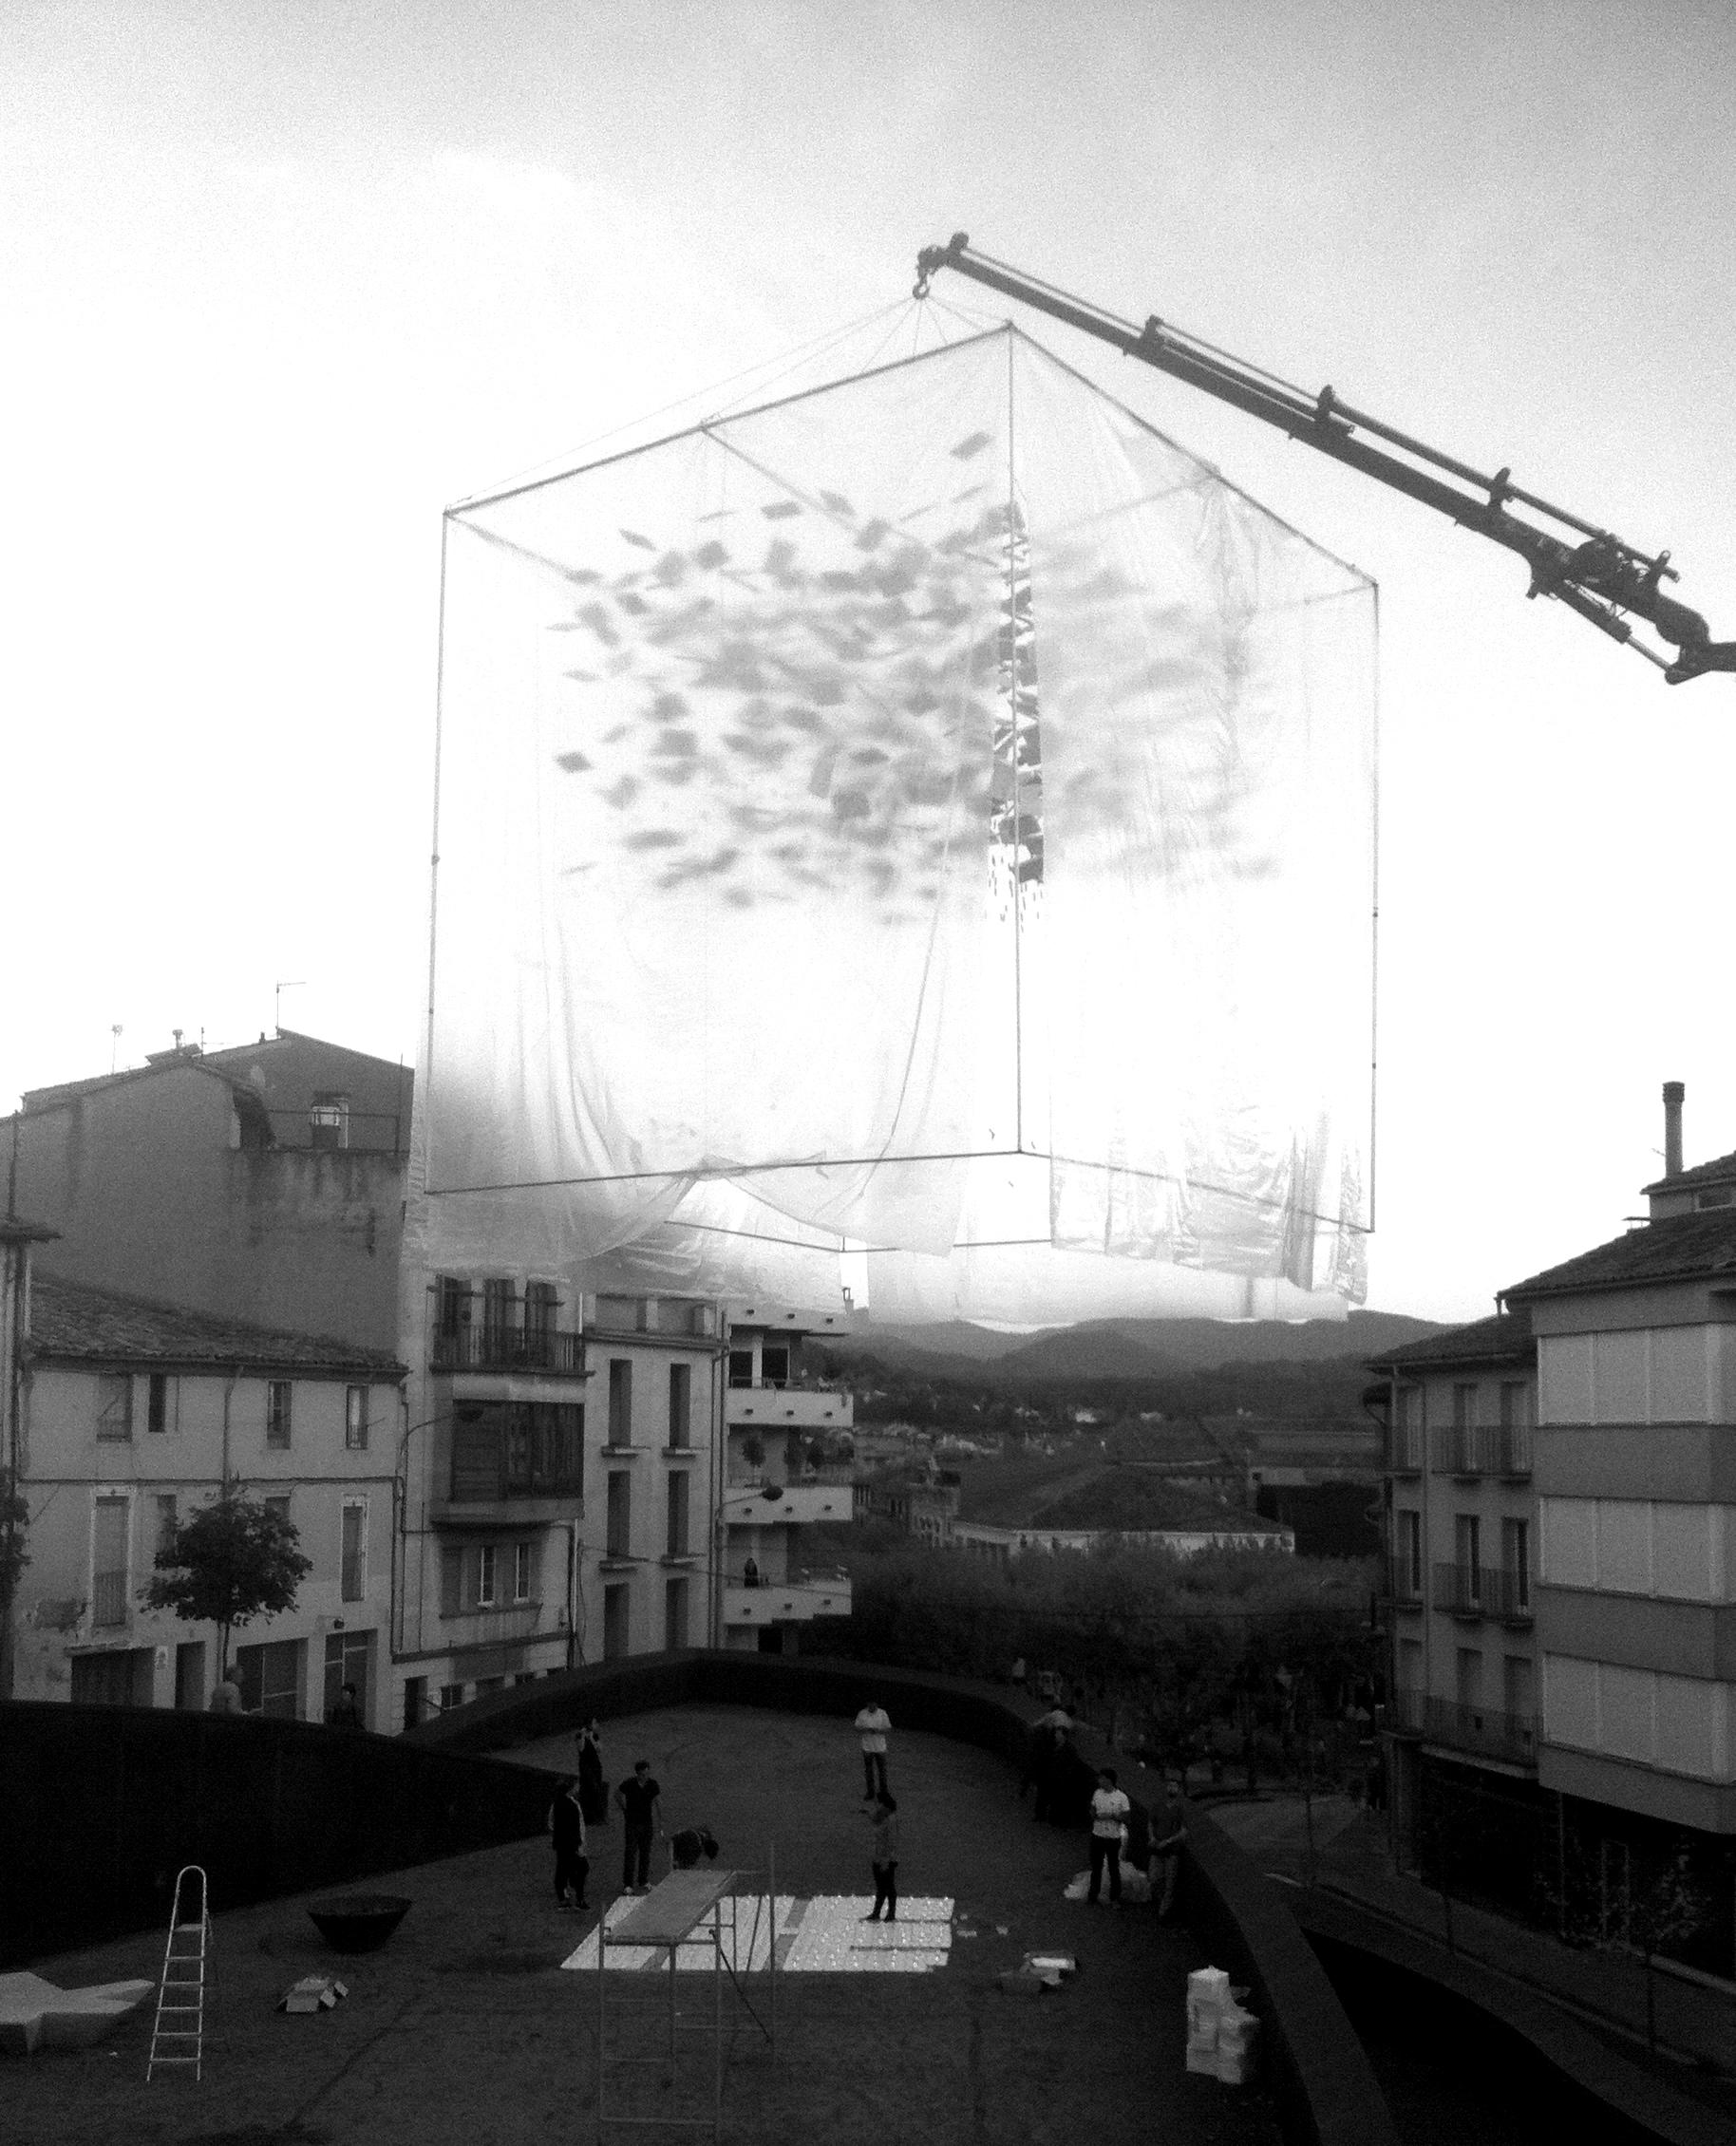 Muntatge 2 - Foto: Jordi Hidalgo Tané